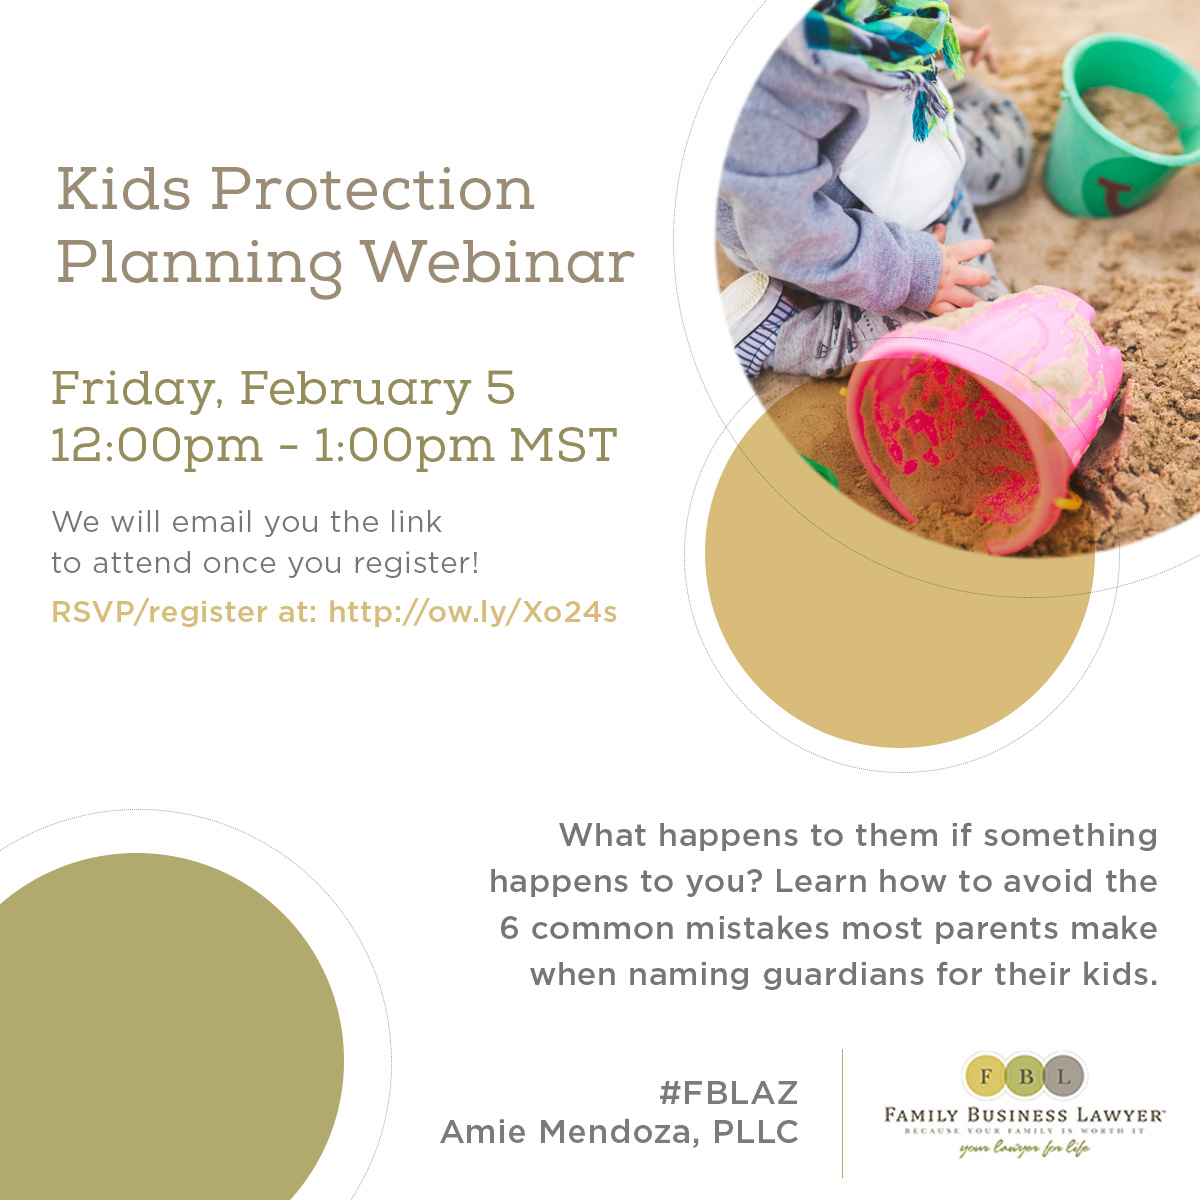 Feb5_EventPost_KidsProtectionPlanningWebinar